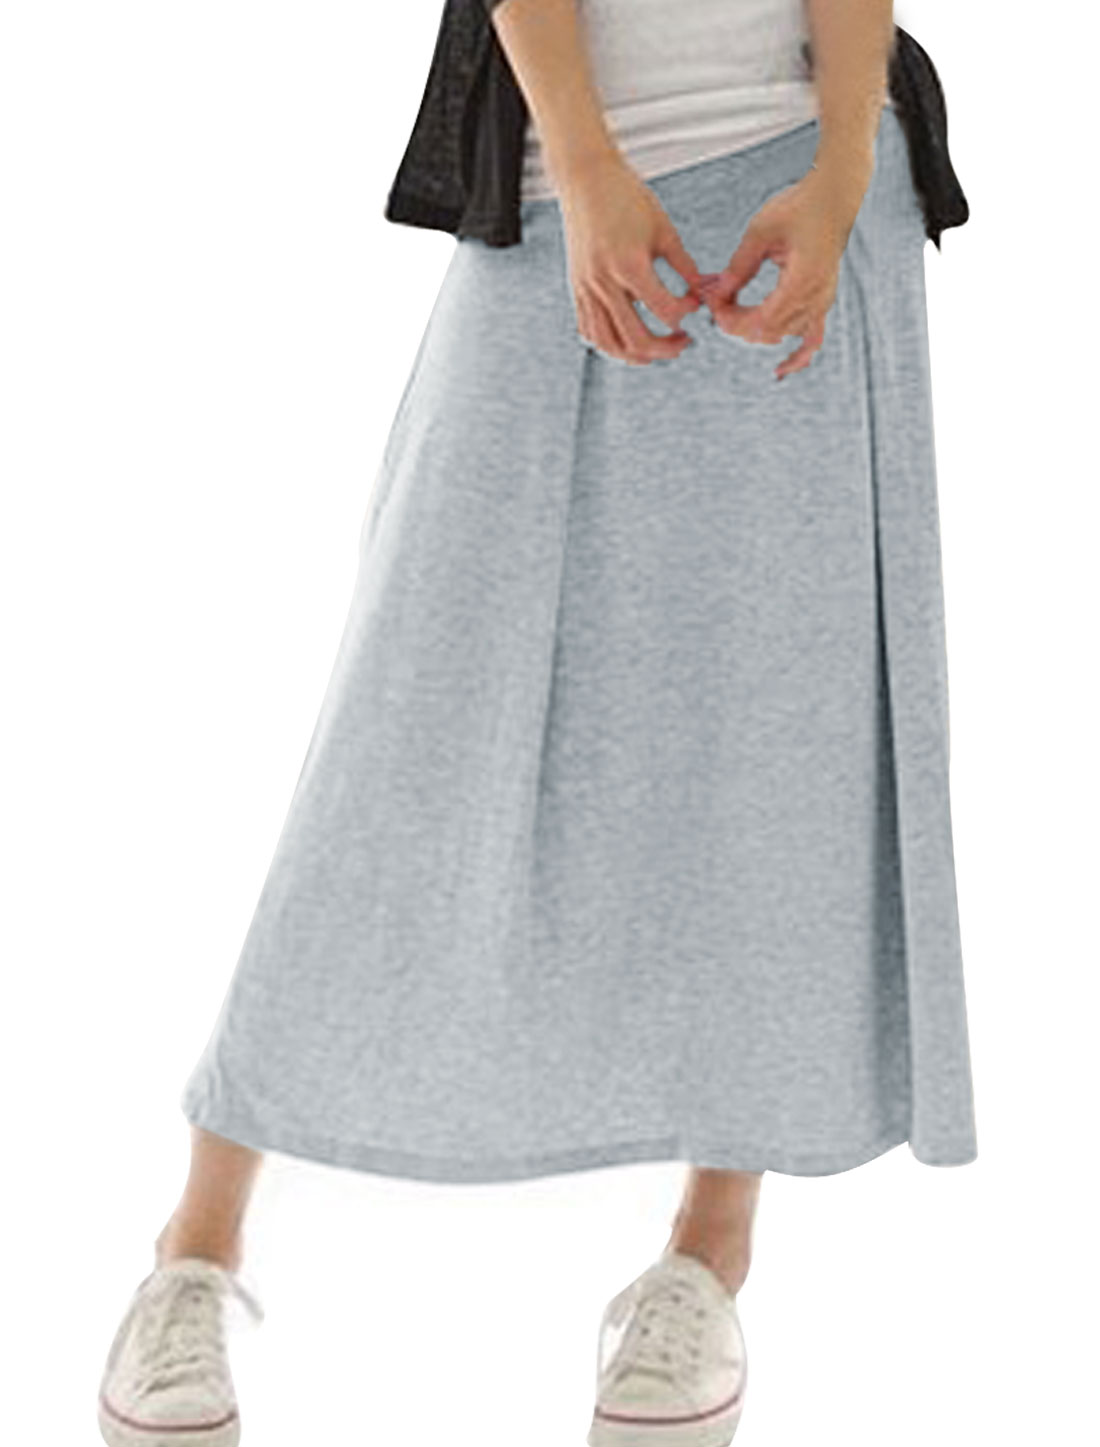 Women XS Light Grey Solid Color Elastic Waist Design Stylish Fashion Skirt